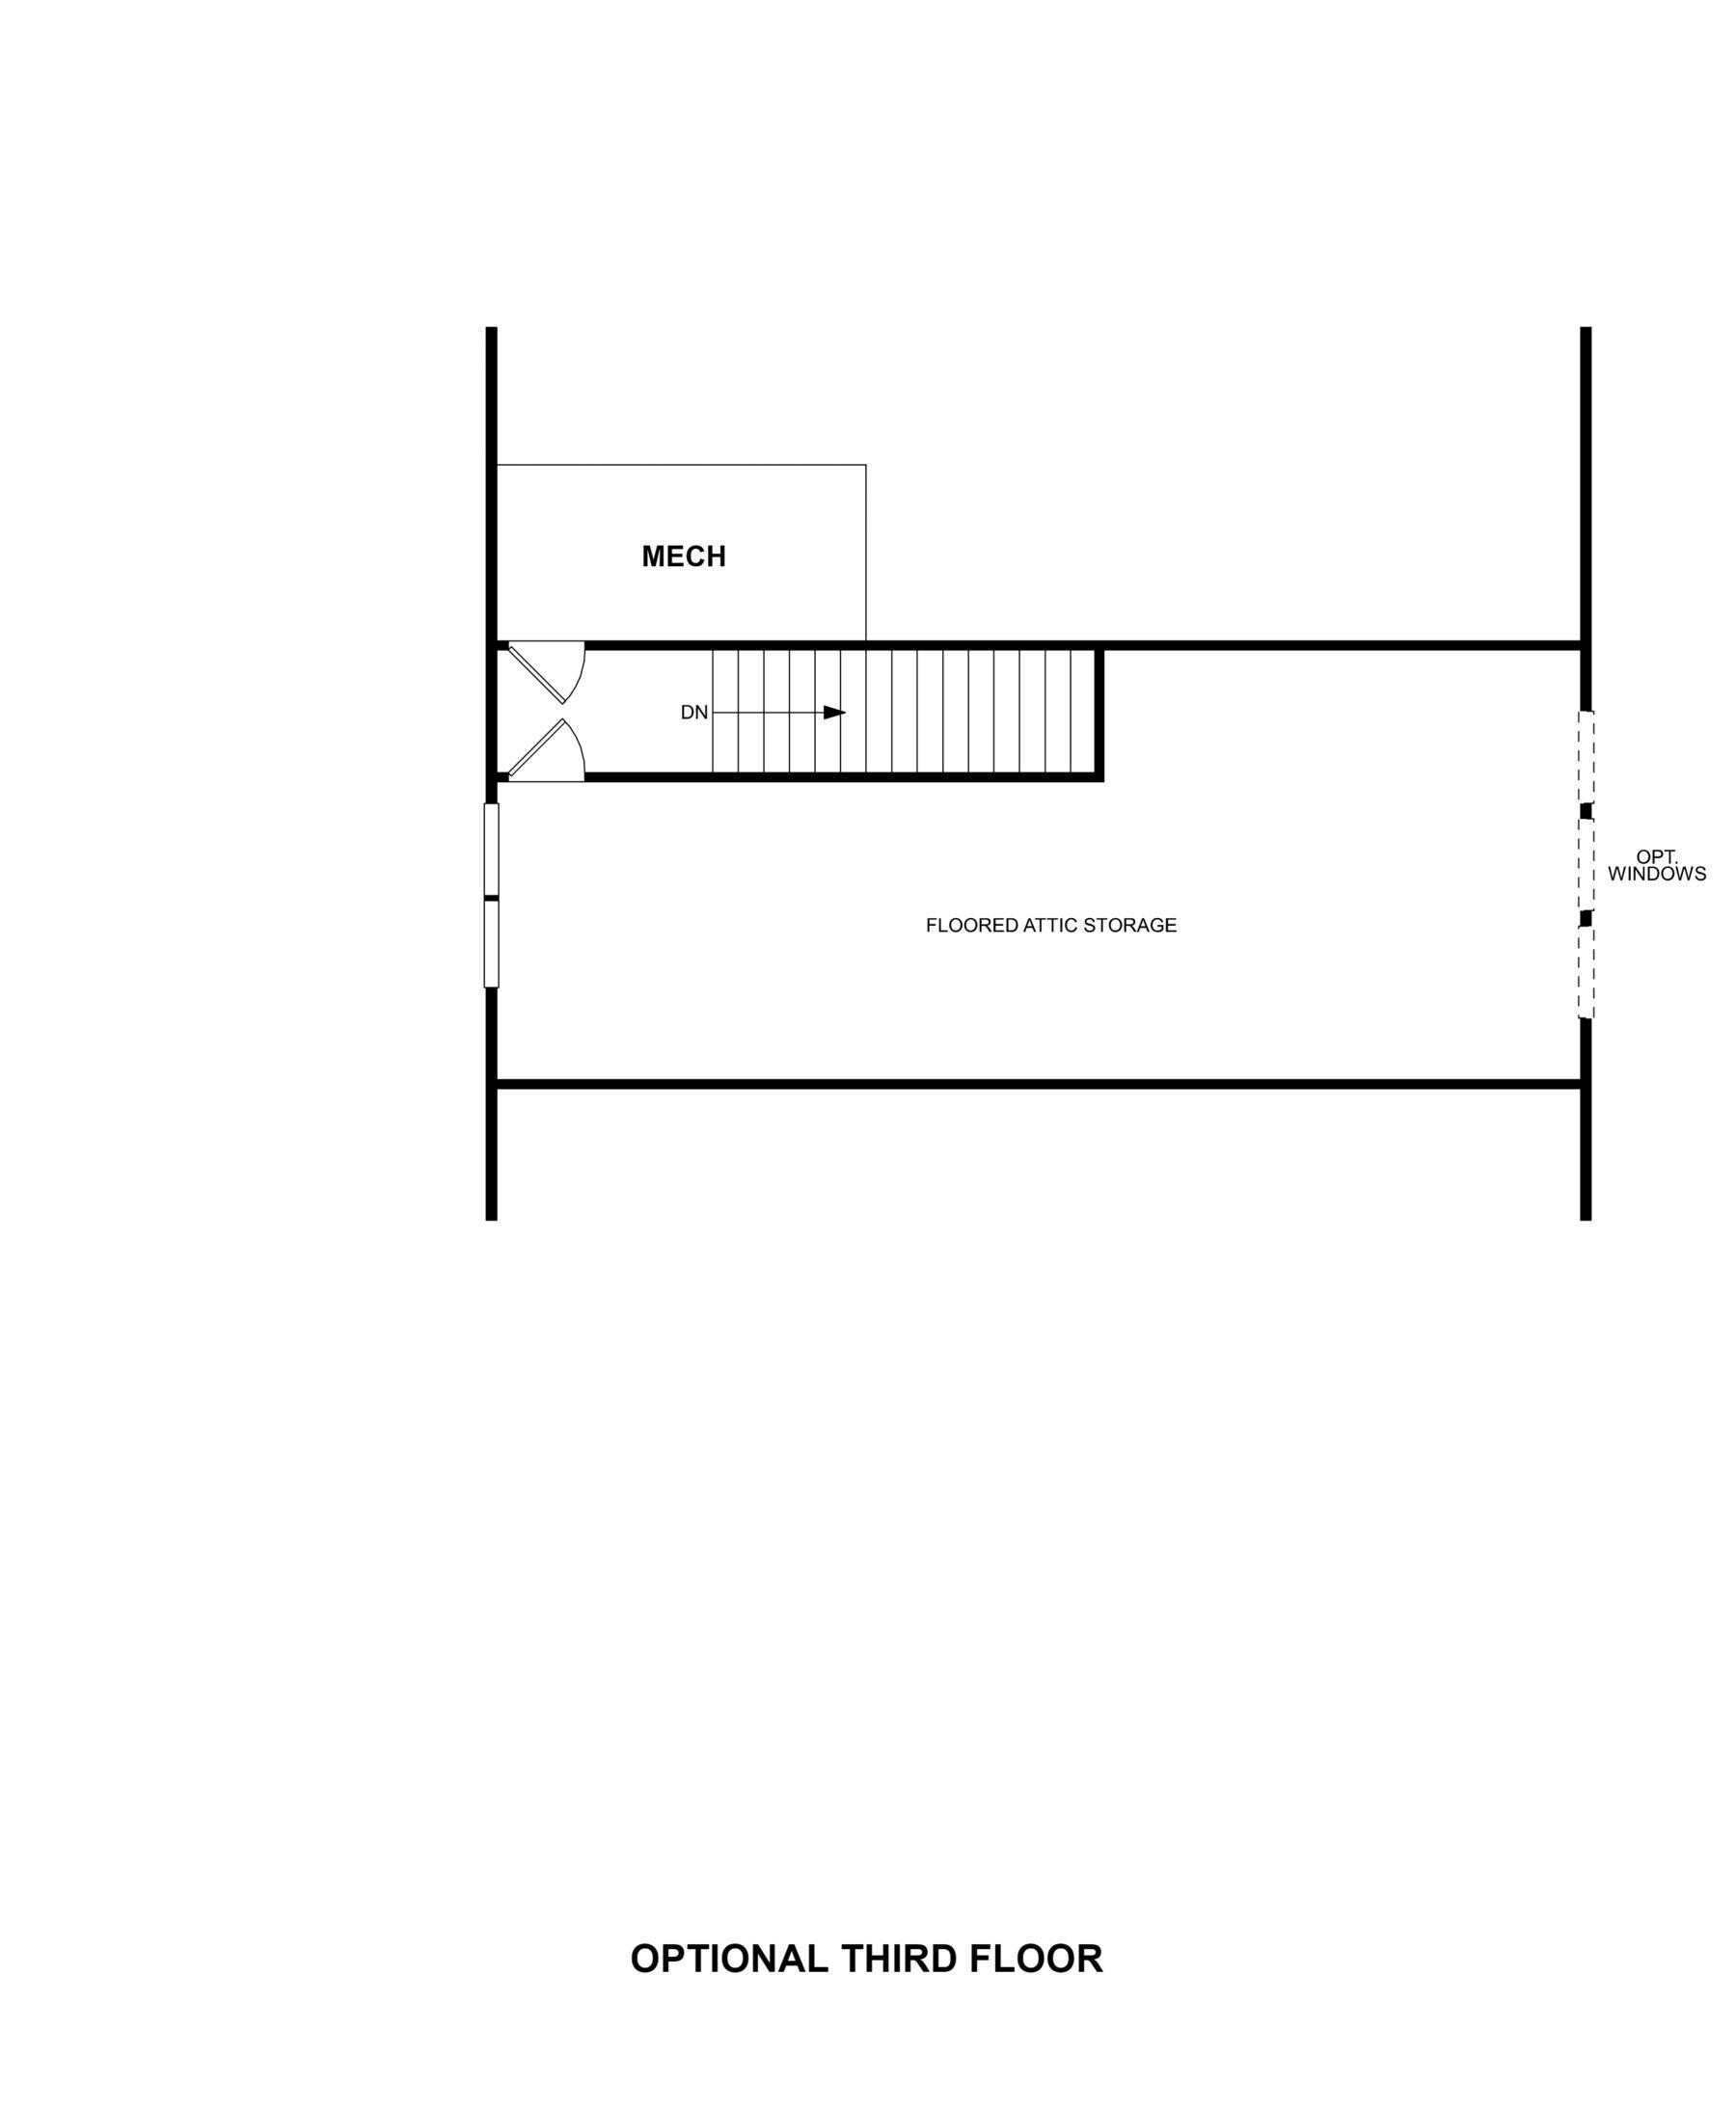 Grove at White Oak Watauga Optional Third Floor